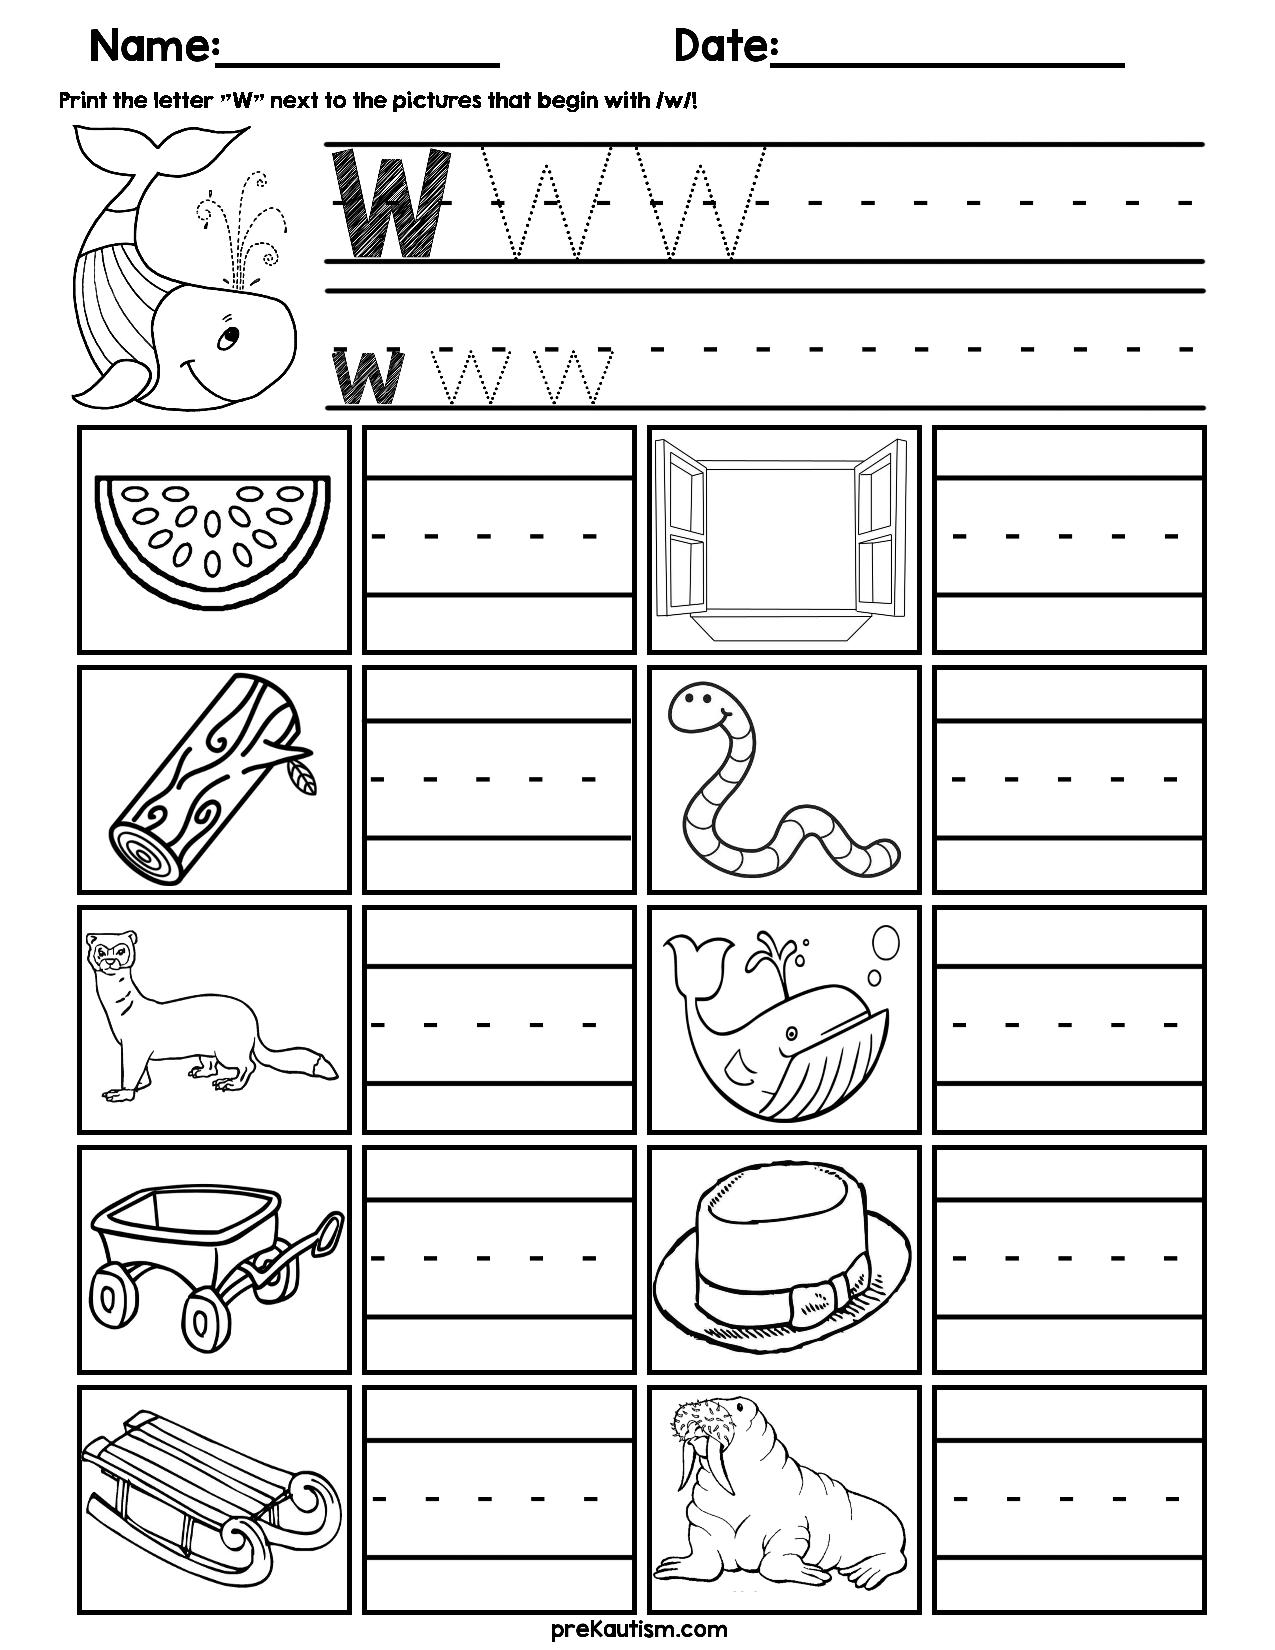 Initial Consonant Practice Worksheets Worksheets Practices Worksheets Alphabet Worksheets [ 1650 x 1275 Pixel ]